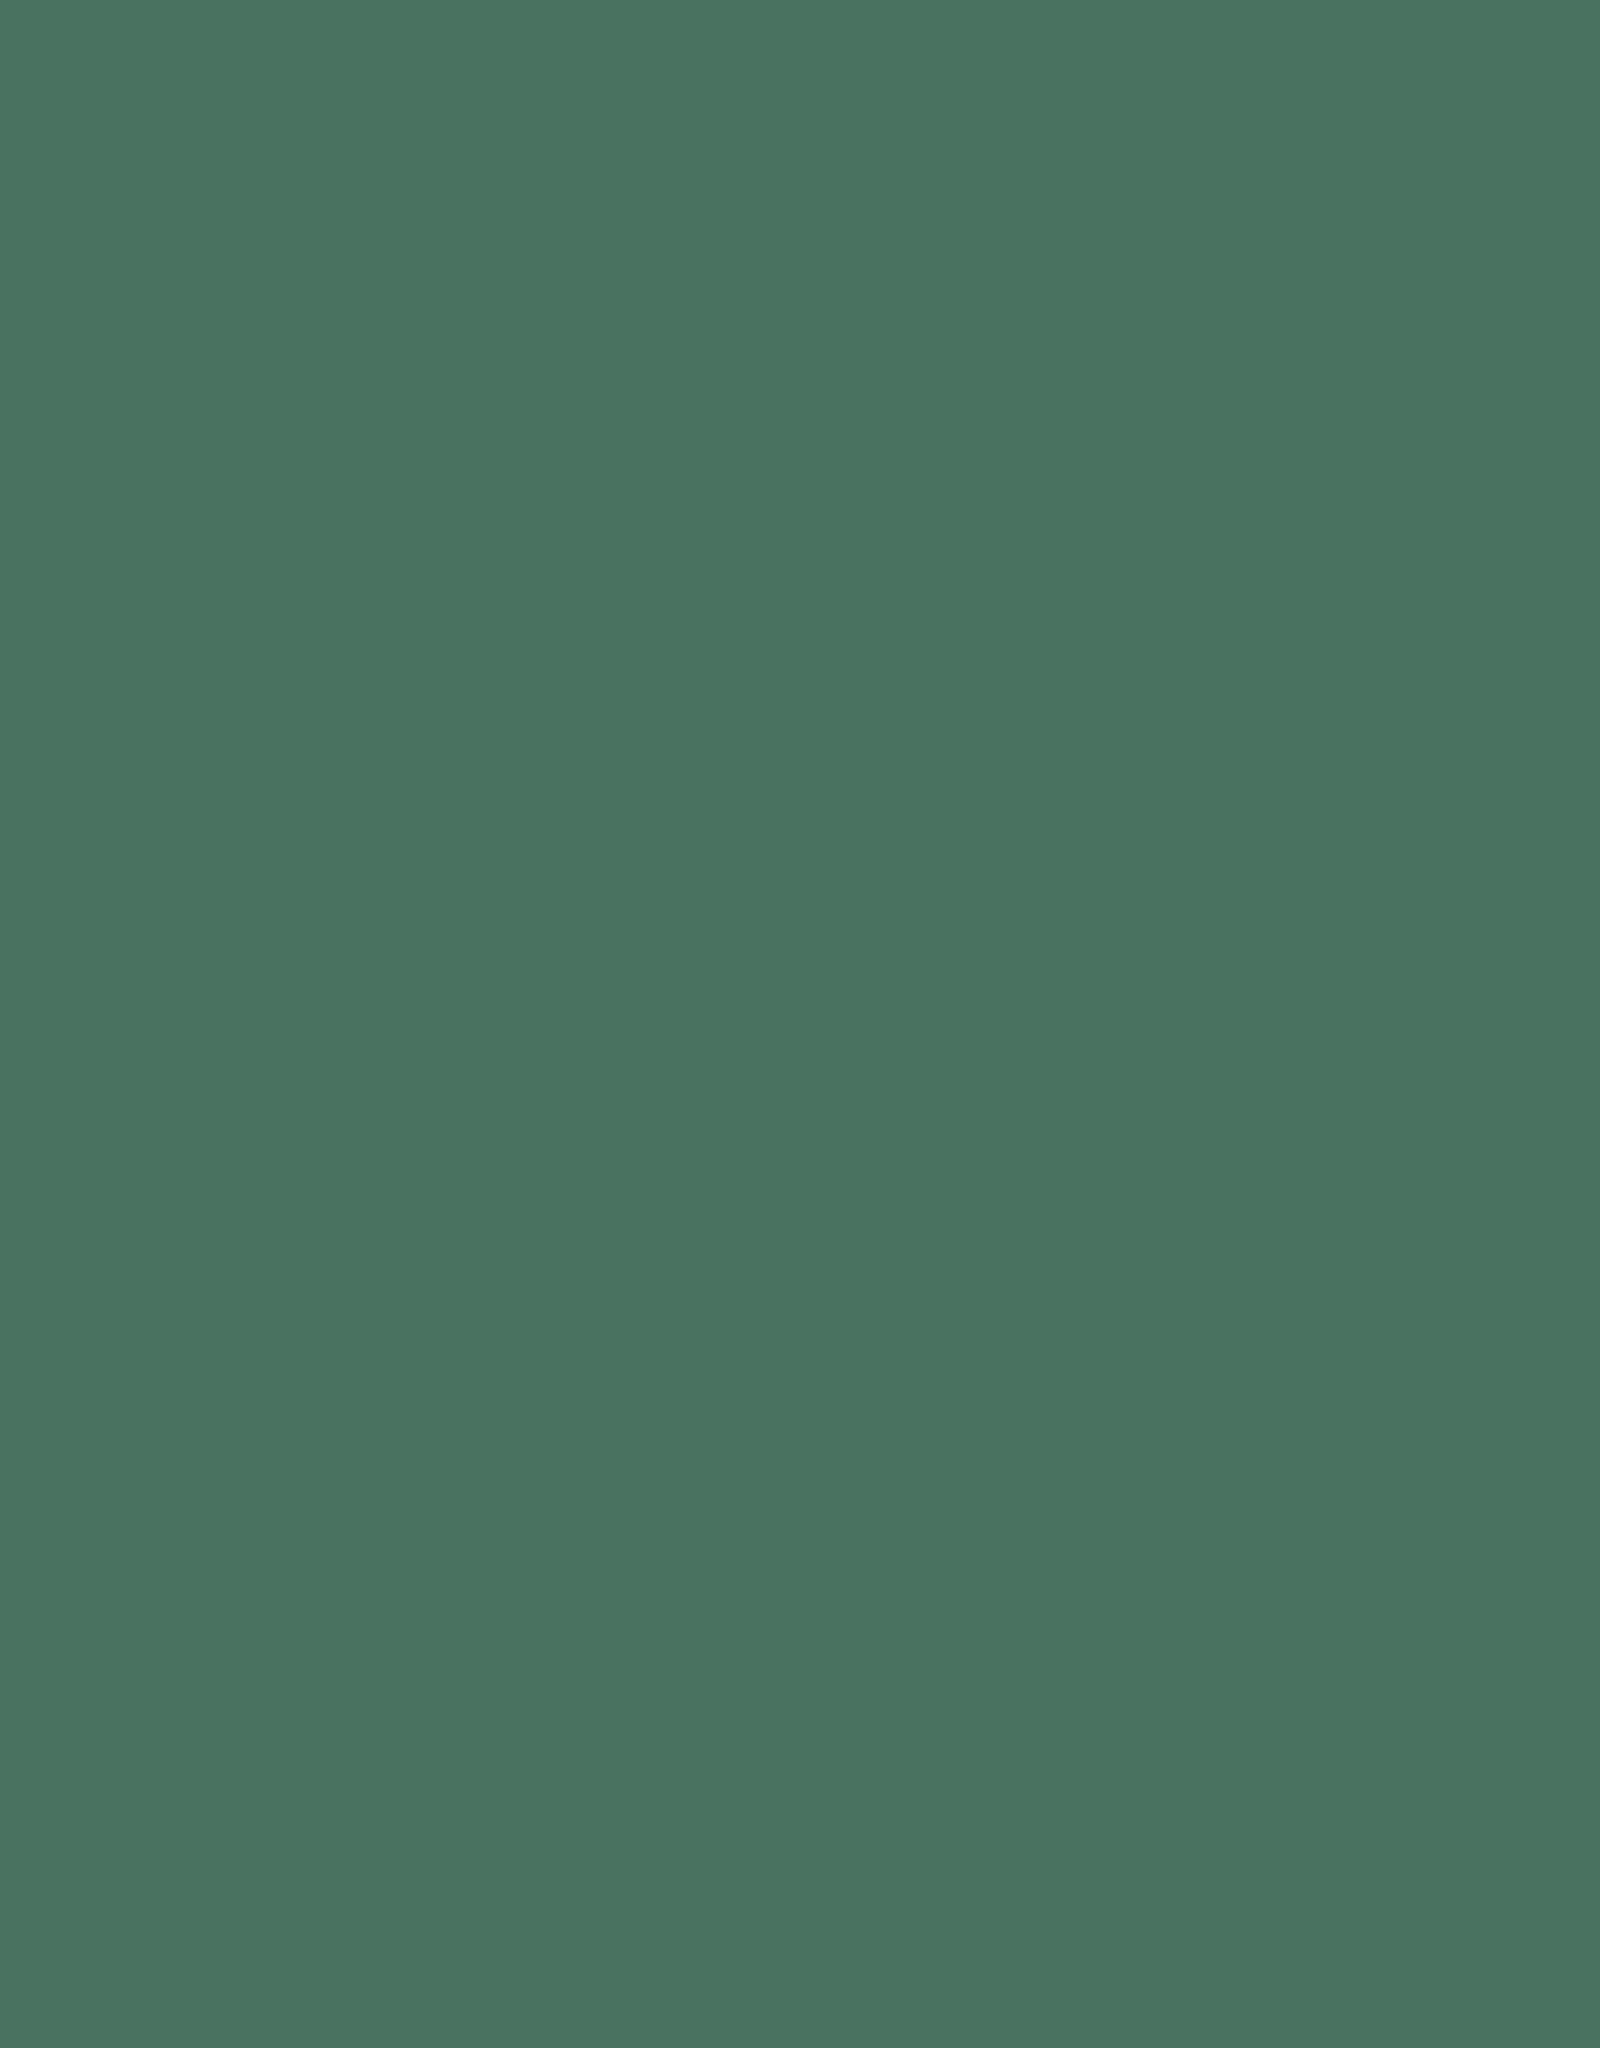 Superior Seamless Superior Seamless 9' Deep Green #12